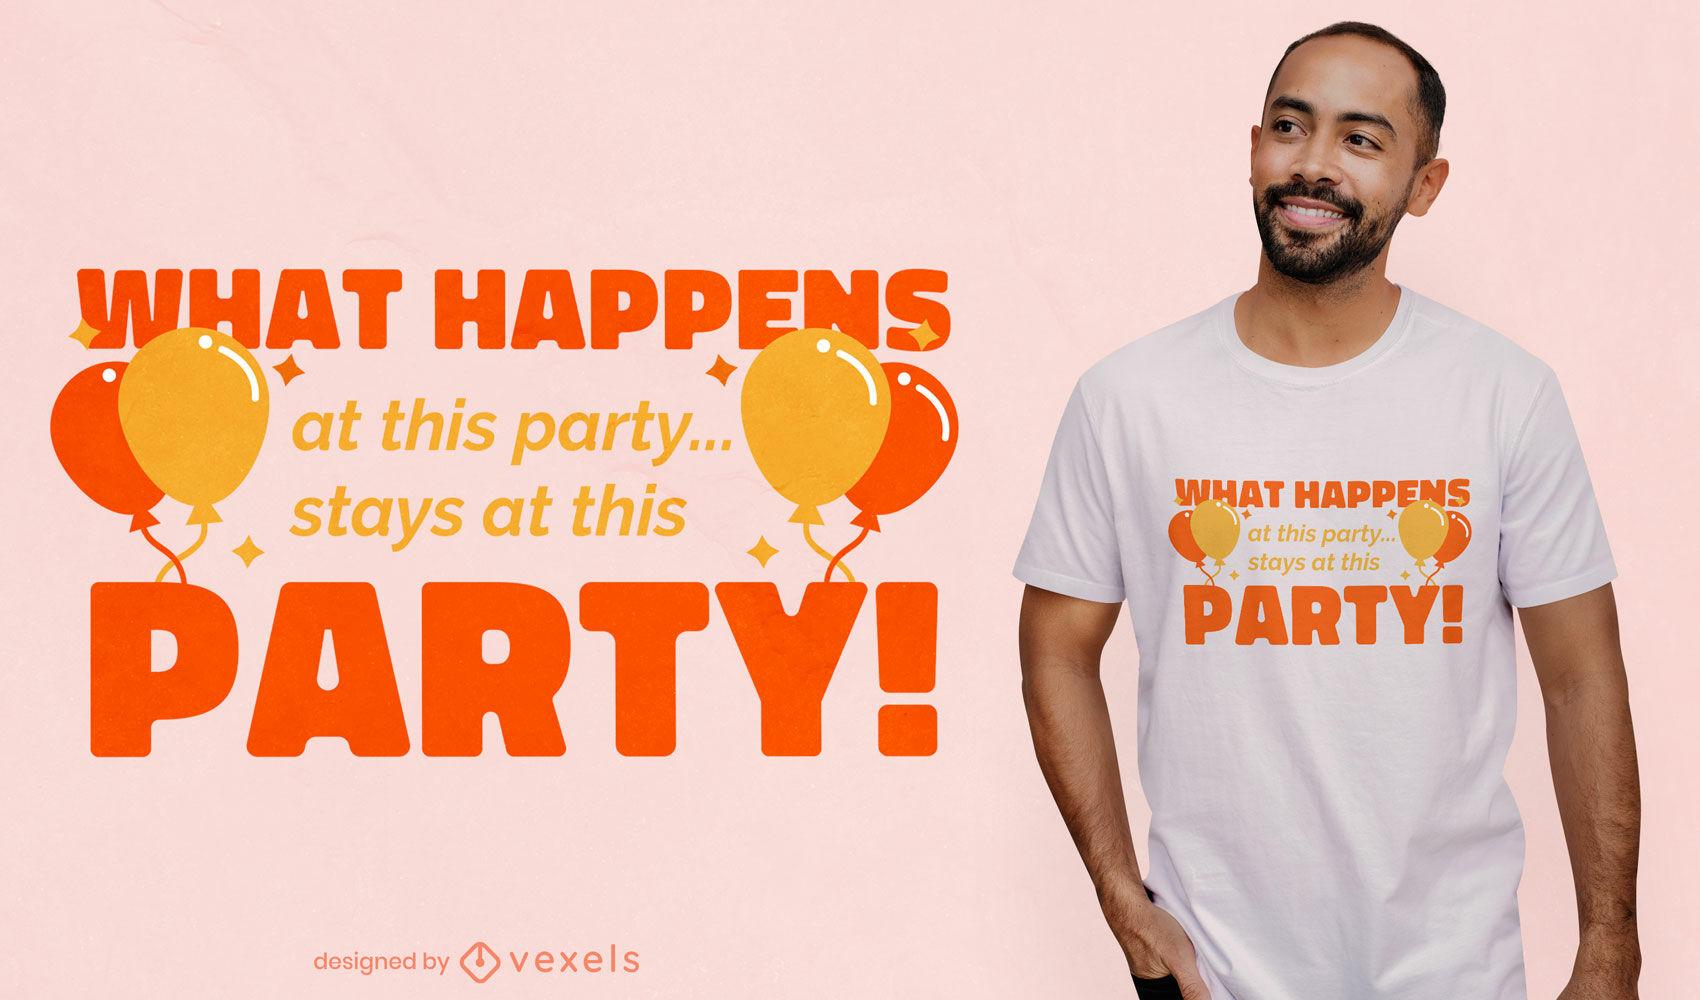 Was passiert beim Party-T-Shirt-Design